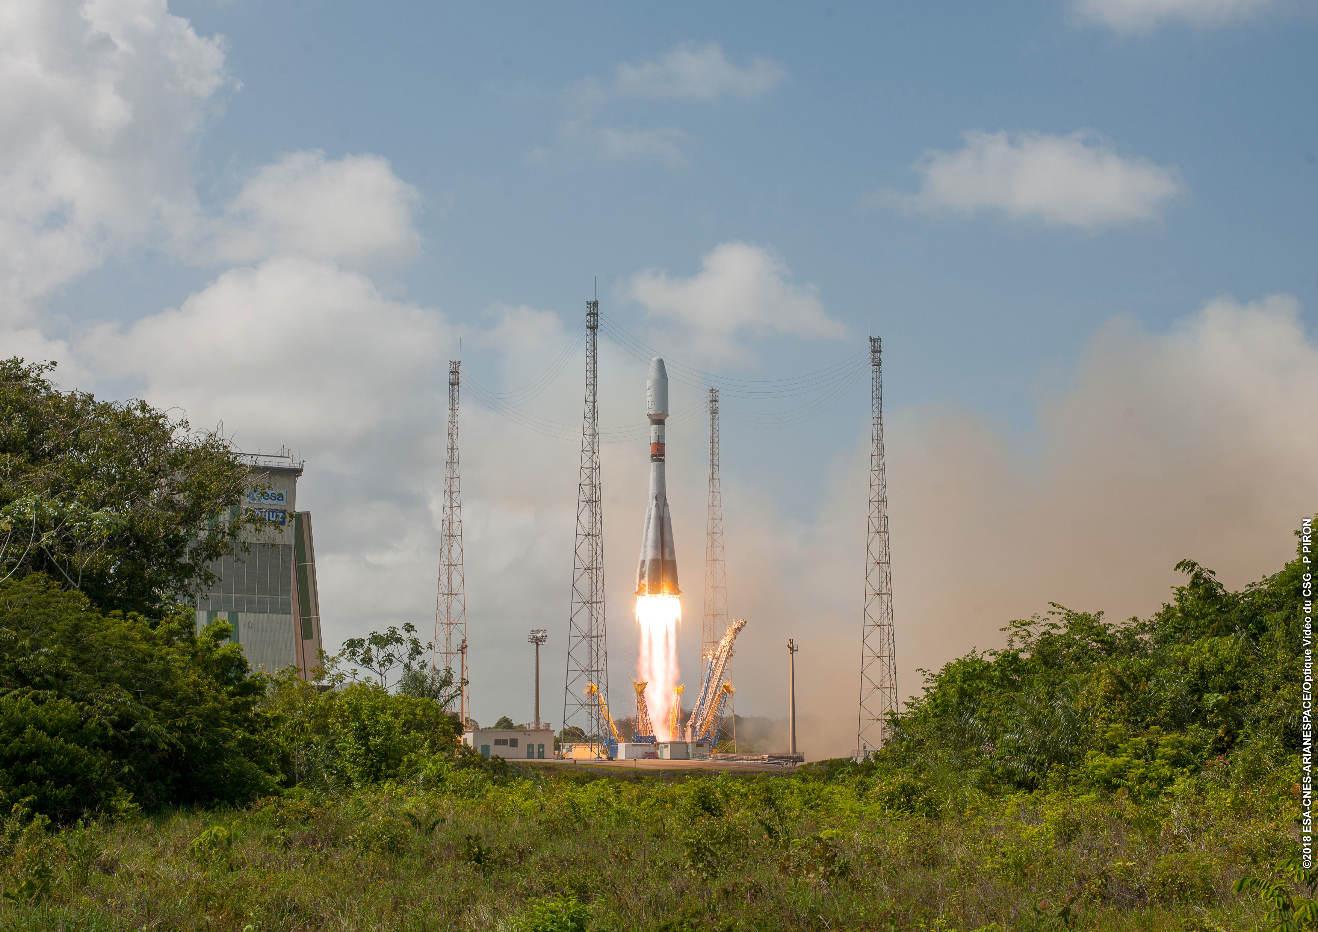 New French spy satellite in orbit